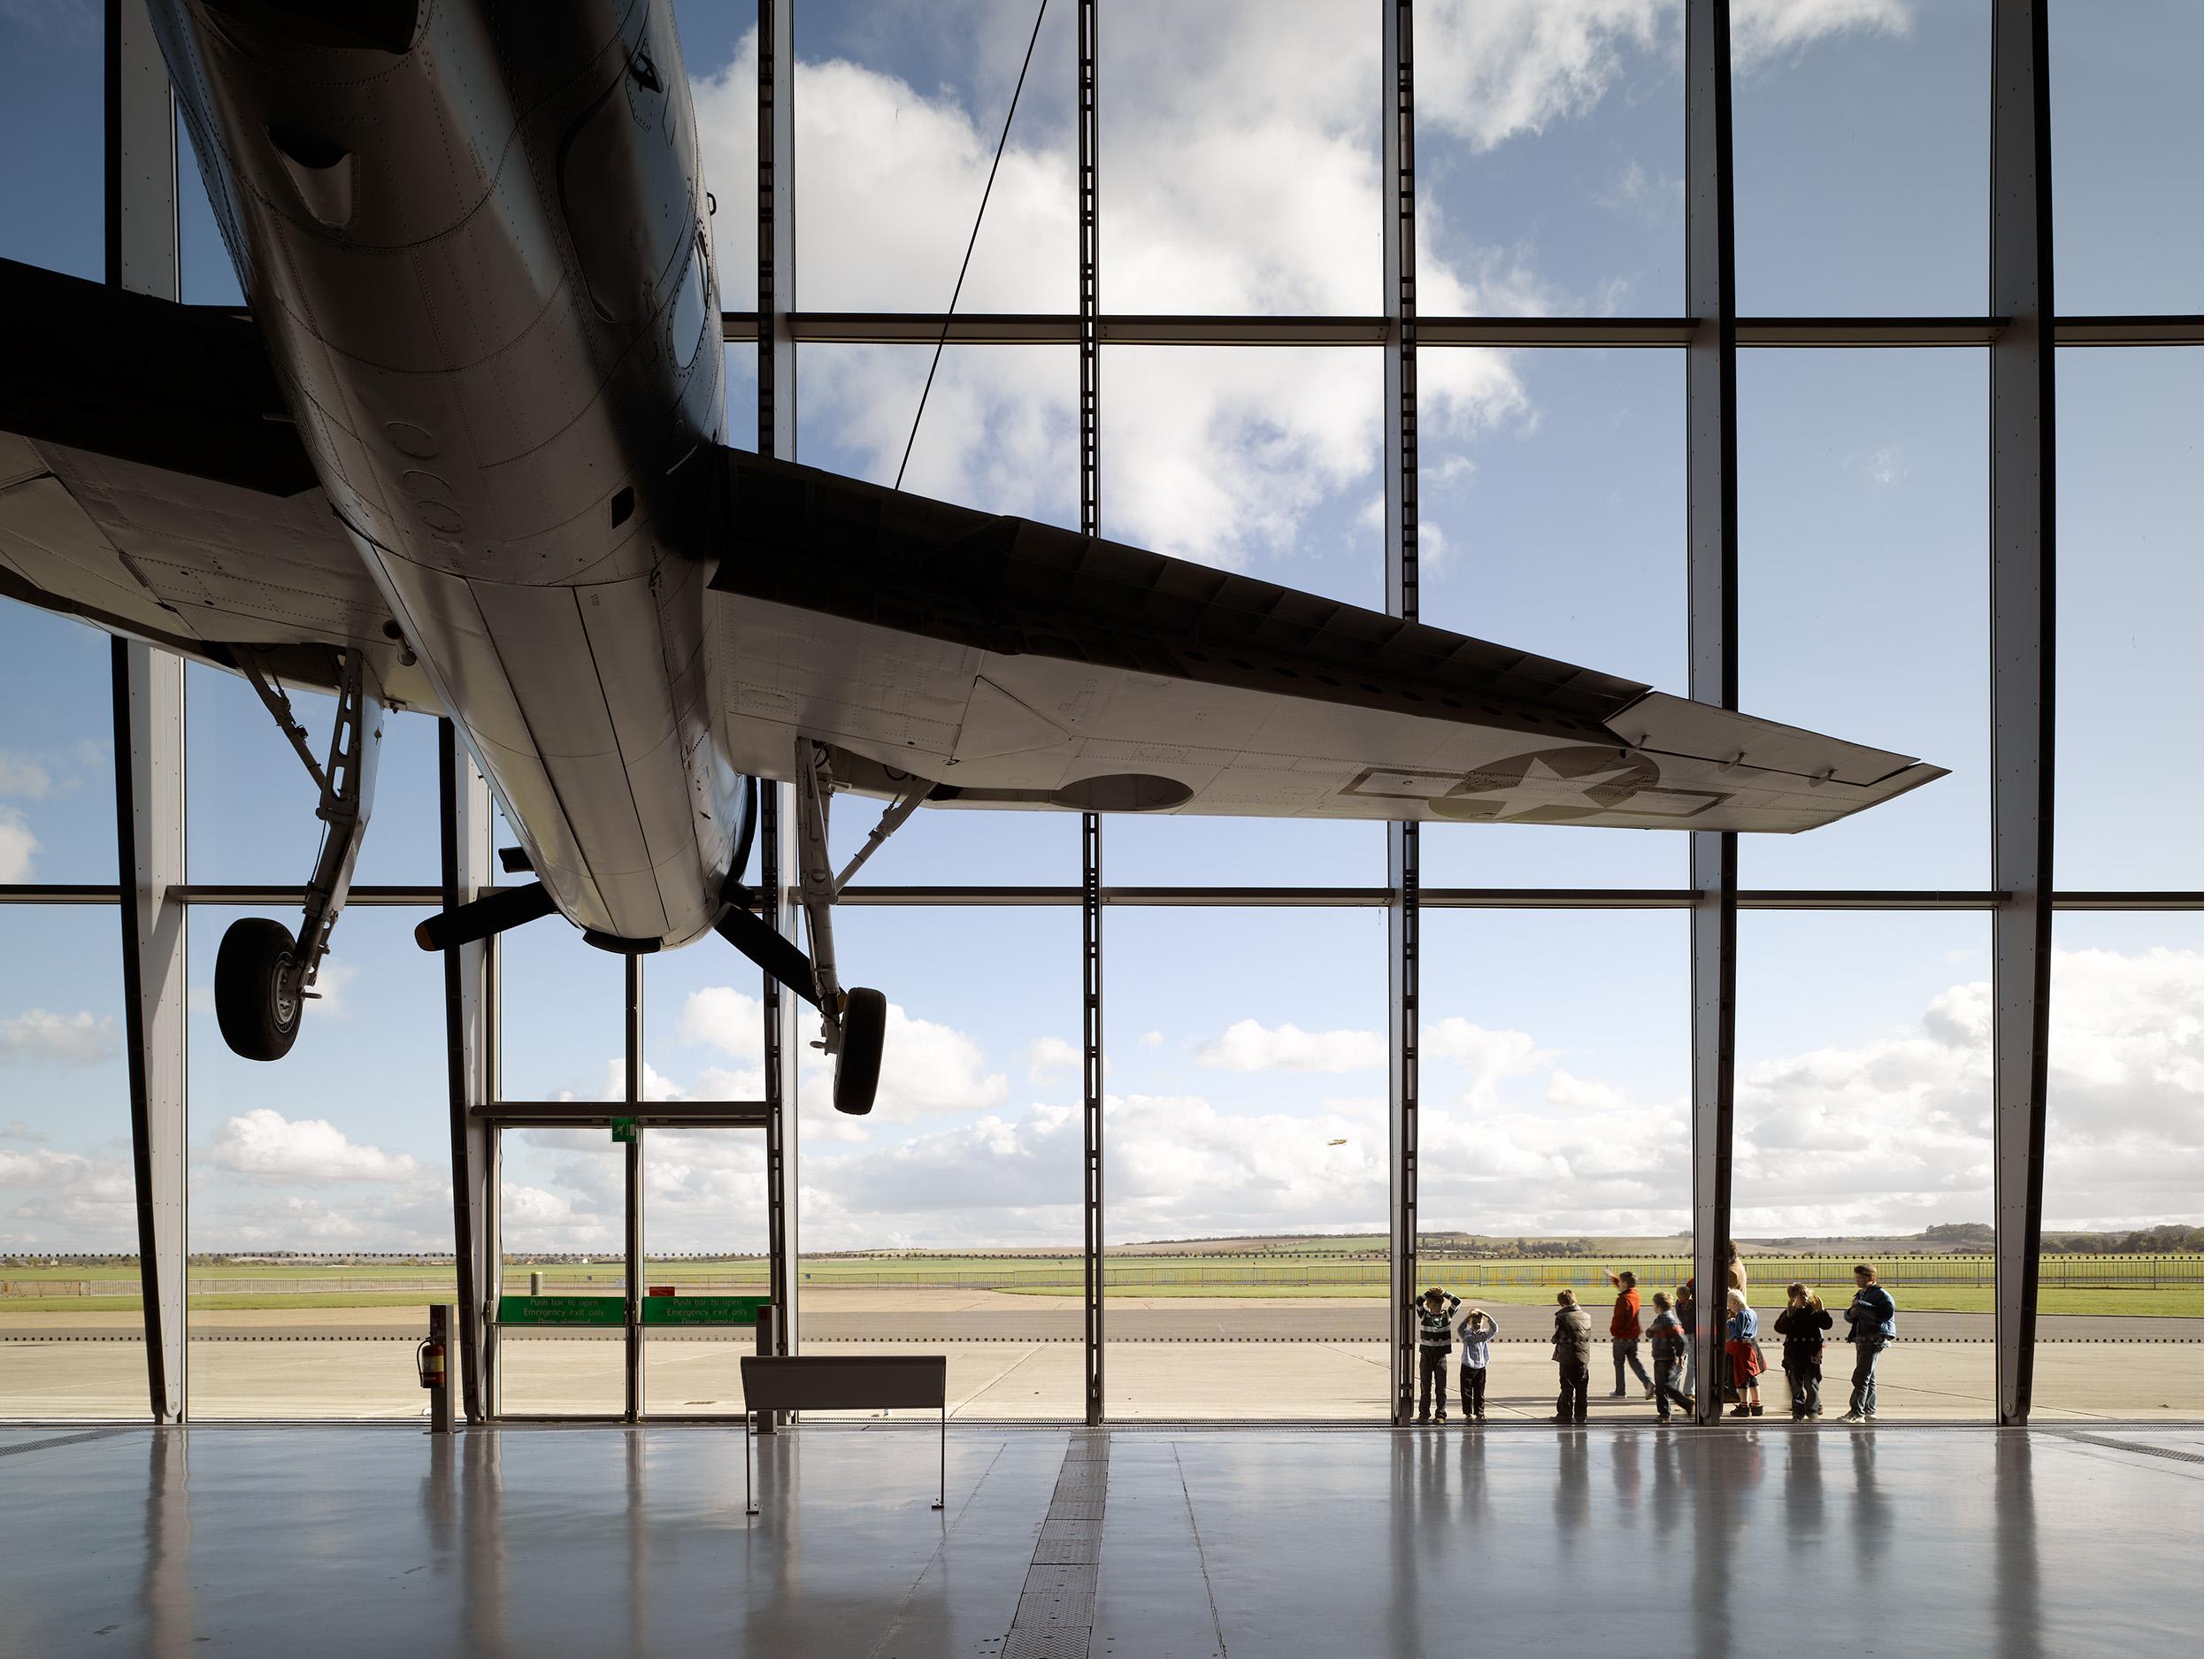 American Airforce Museum / Duxford